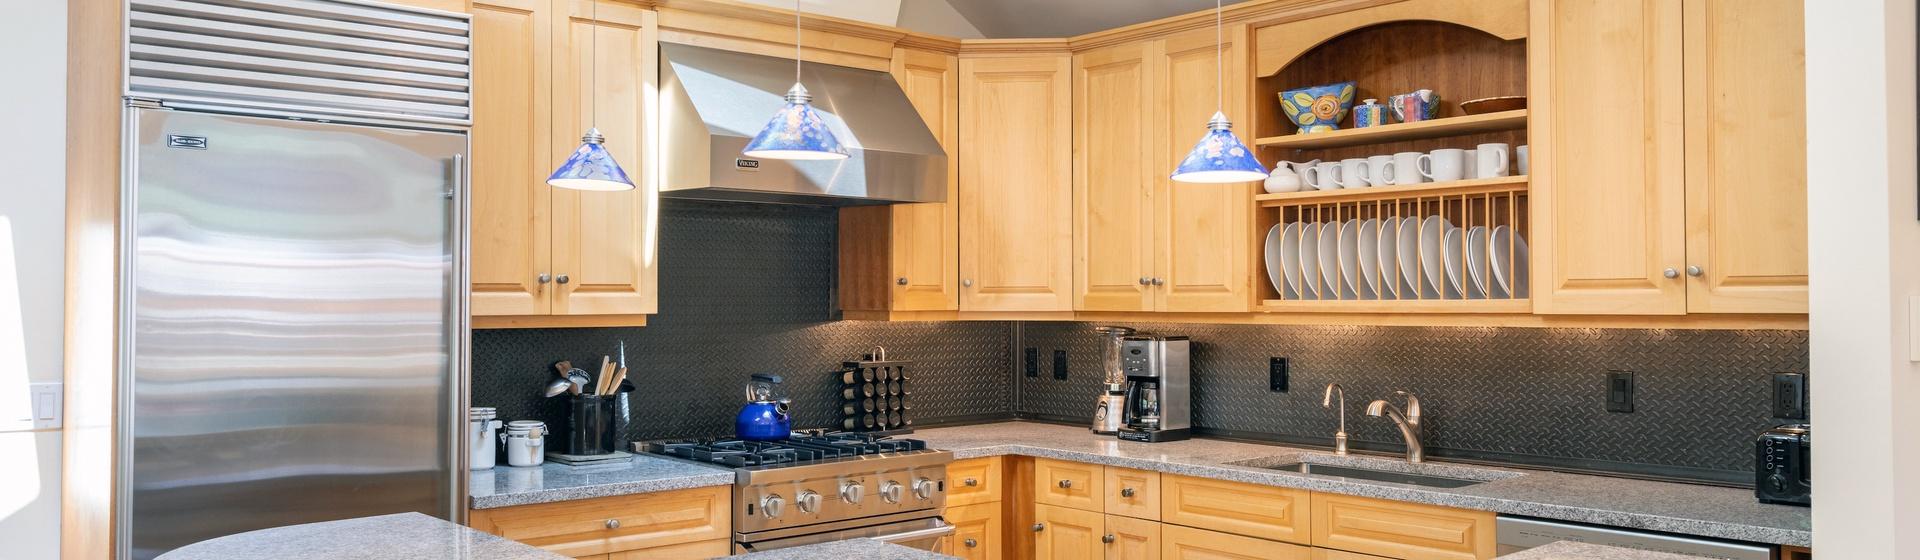 3-Telluride-Pine-Street-Penthouse-A-Kitchen